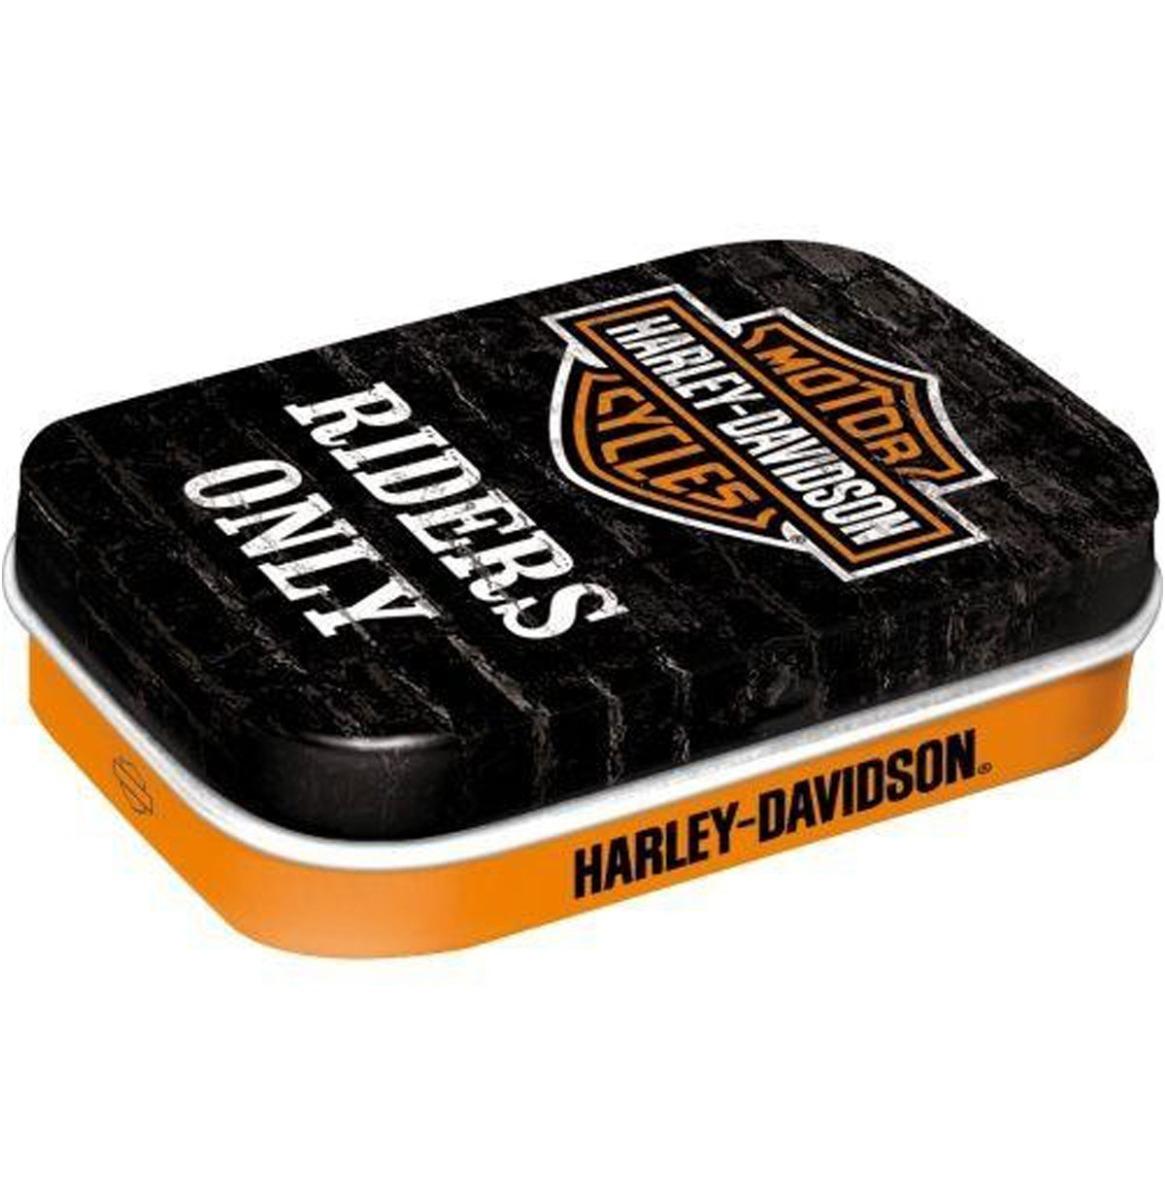 Harley-Davidson Riders Only Pepermunt Blikje